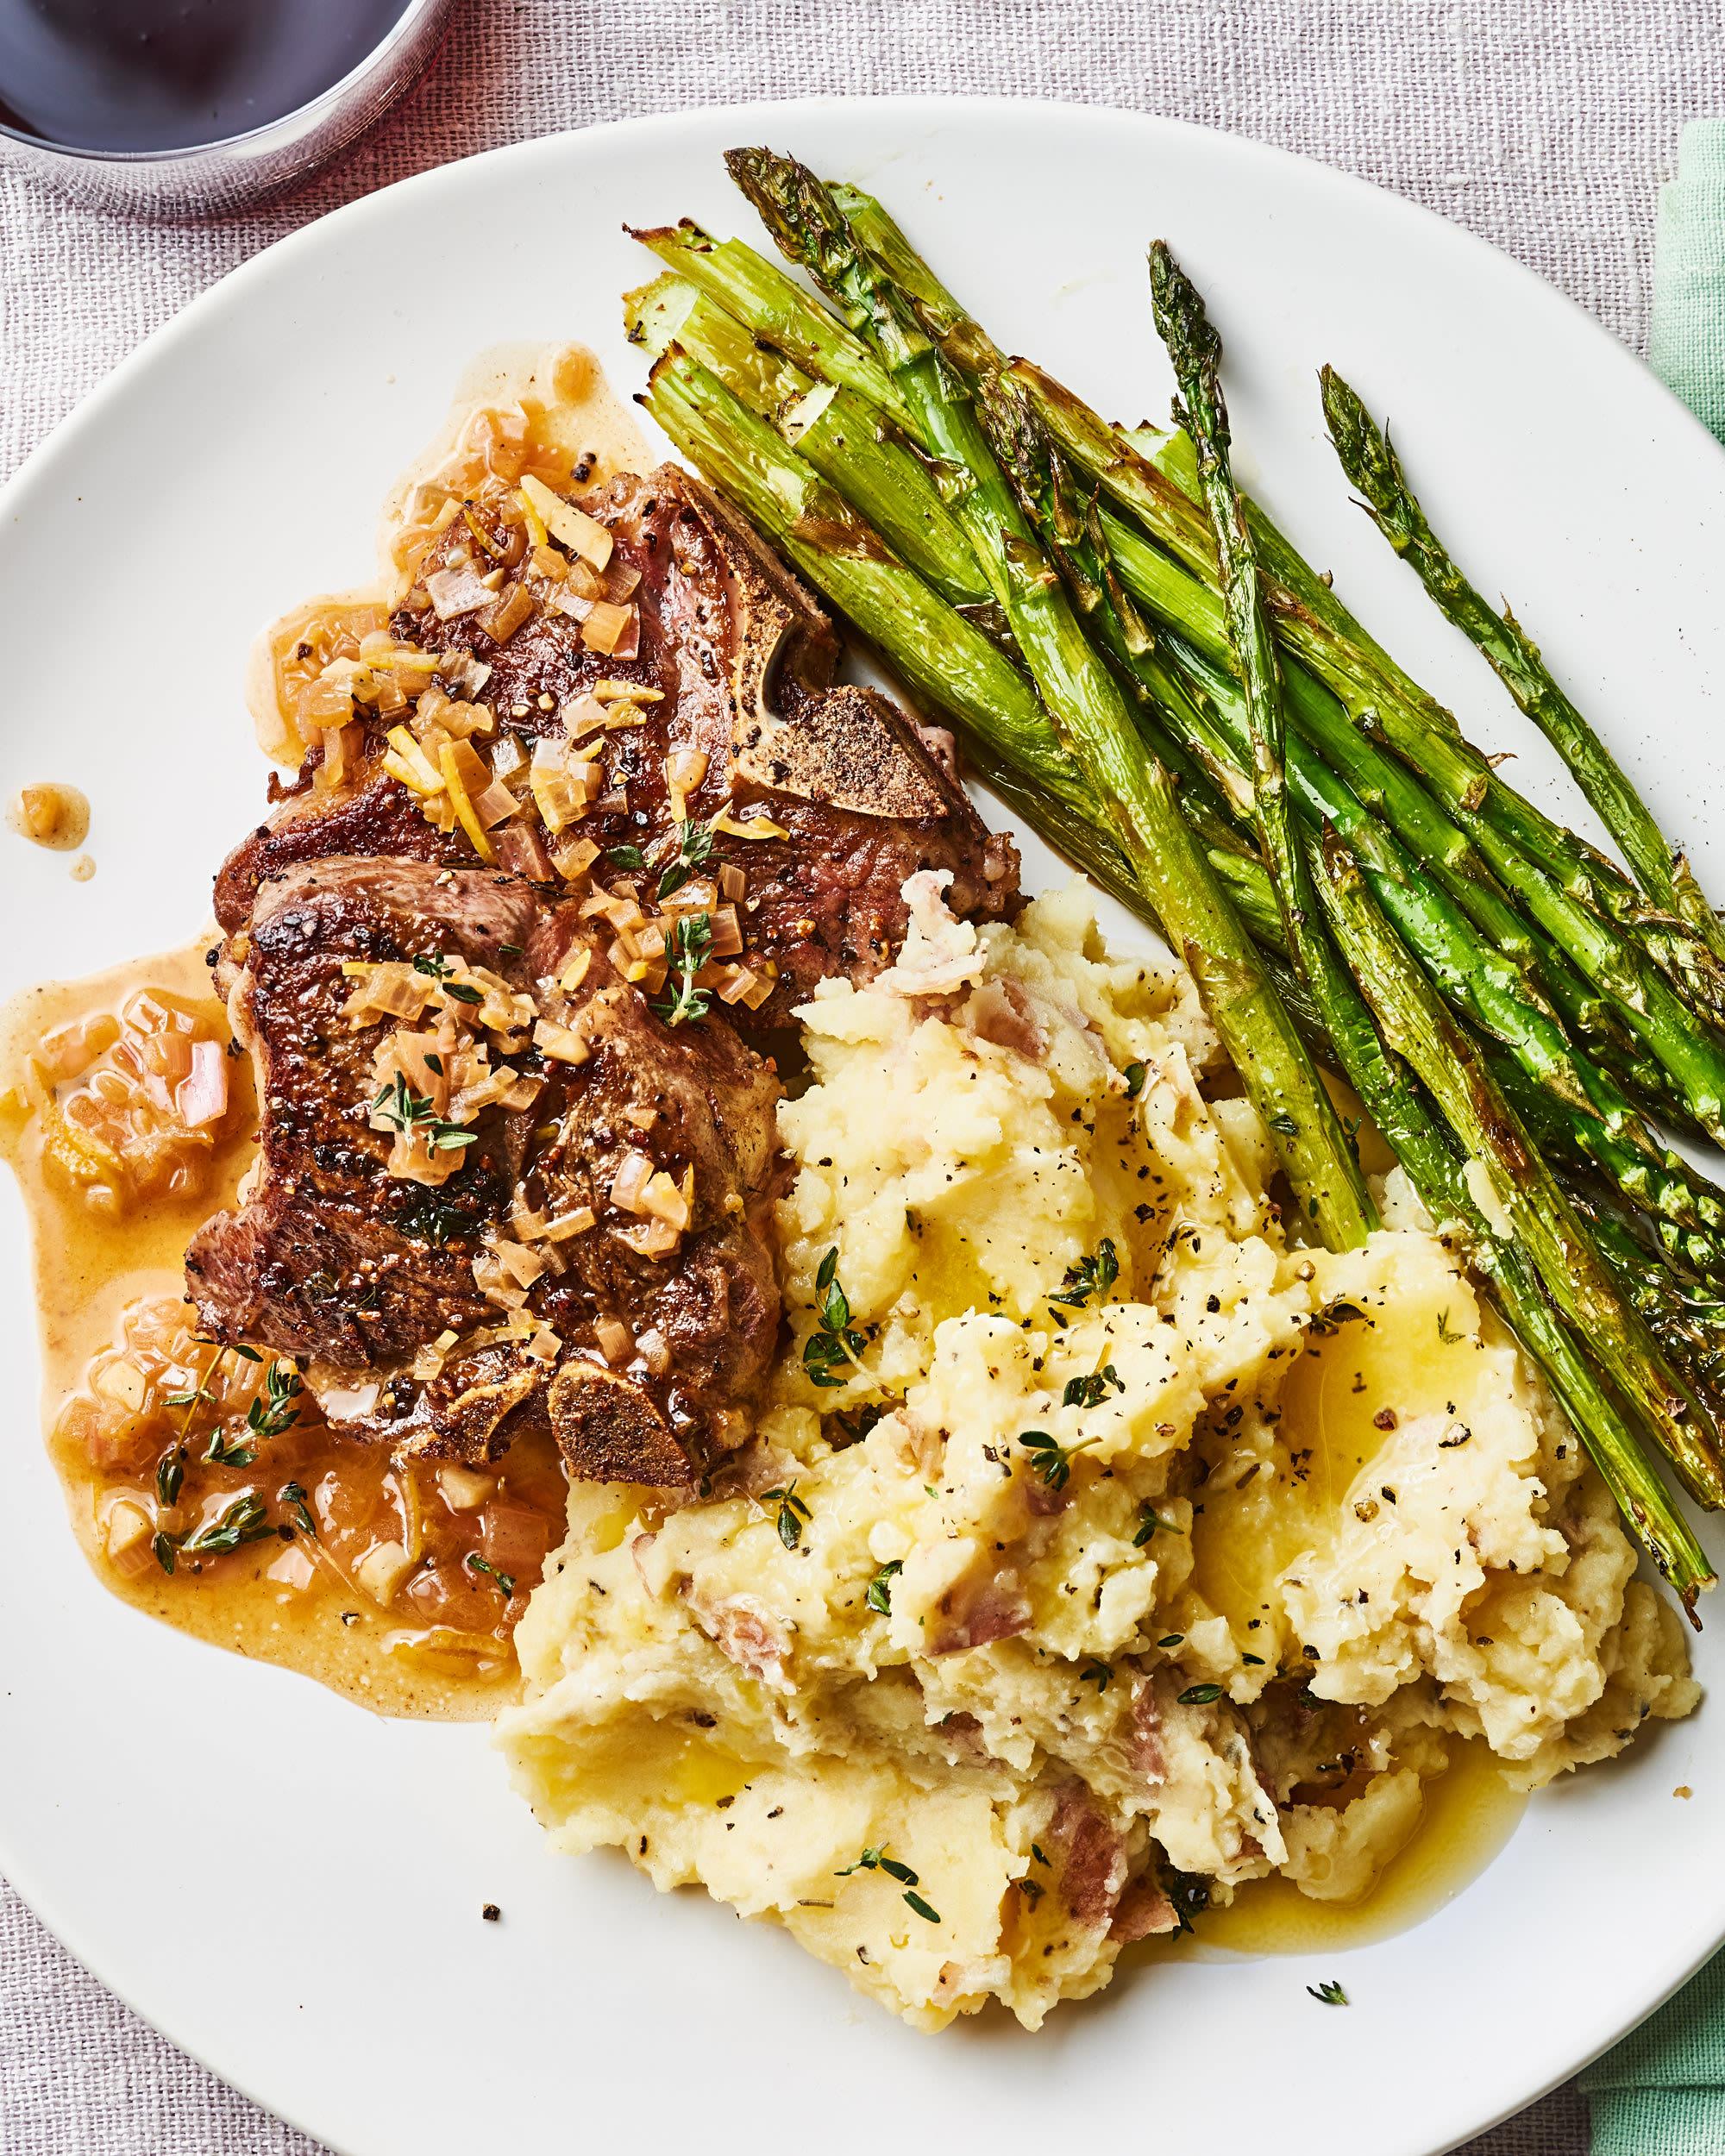 lamb chop recipe dinner How To Cook Lamb Chops